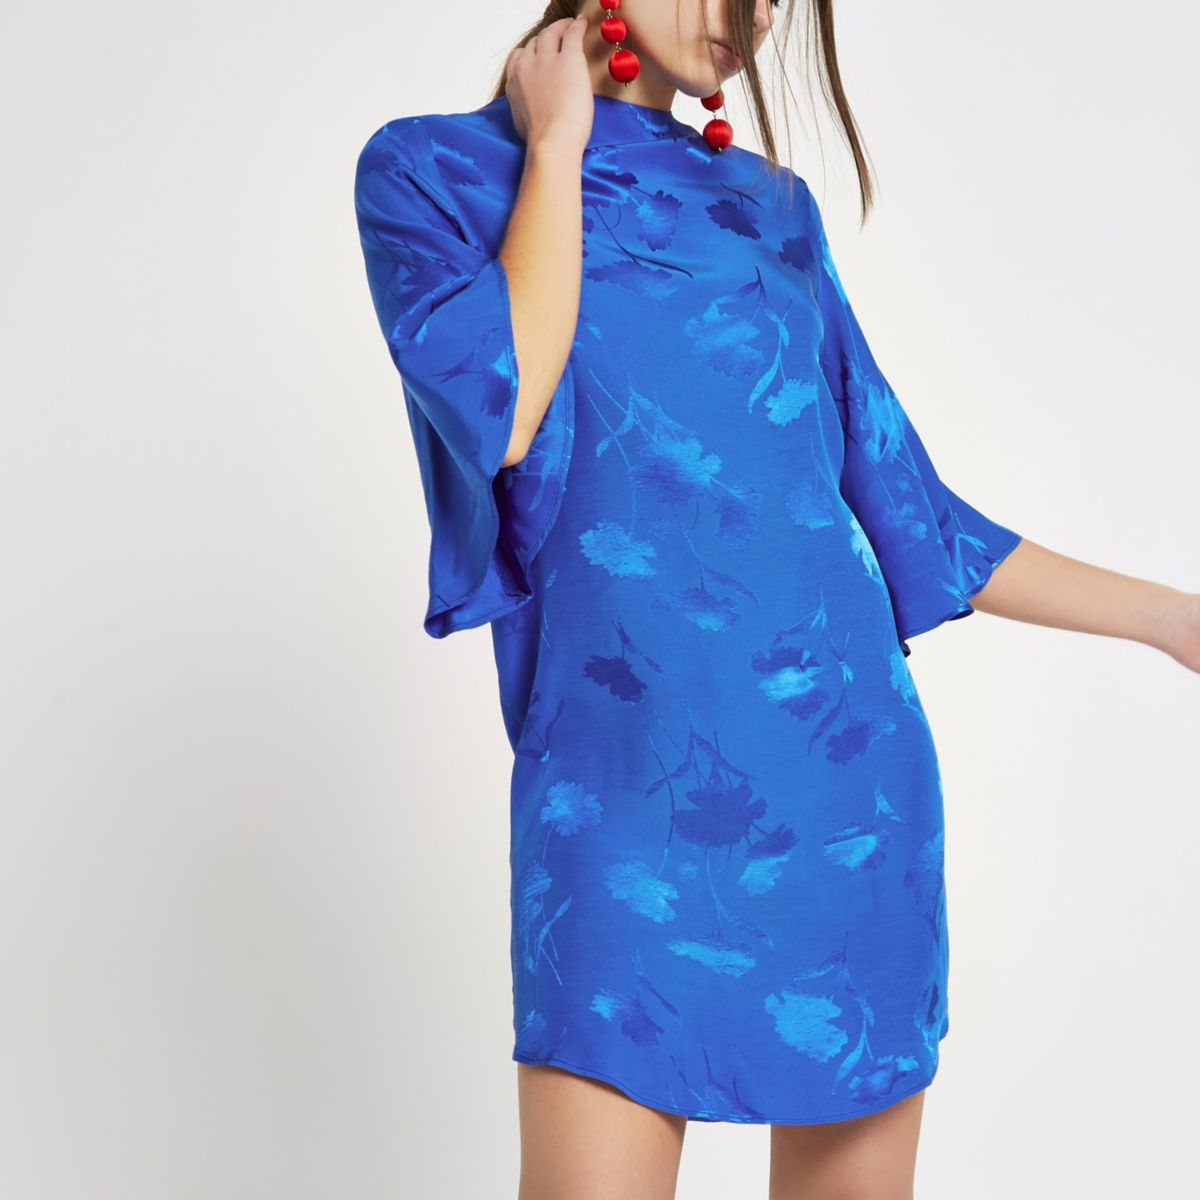 Blue jacquard high neck swing dress